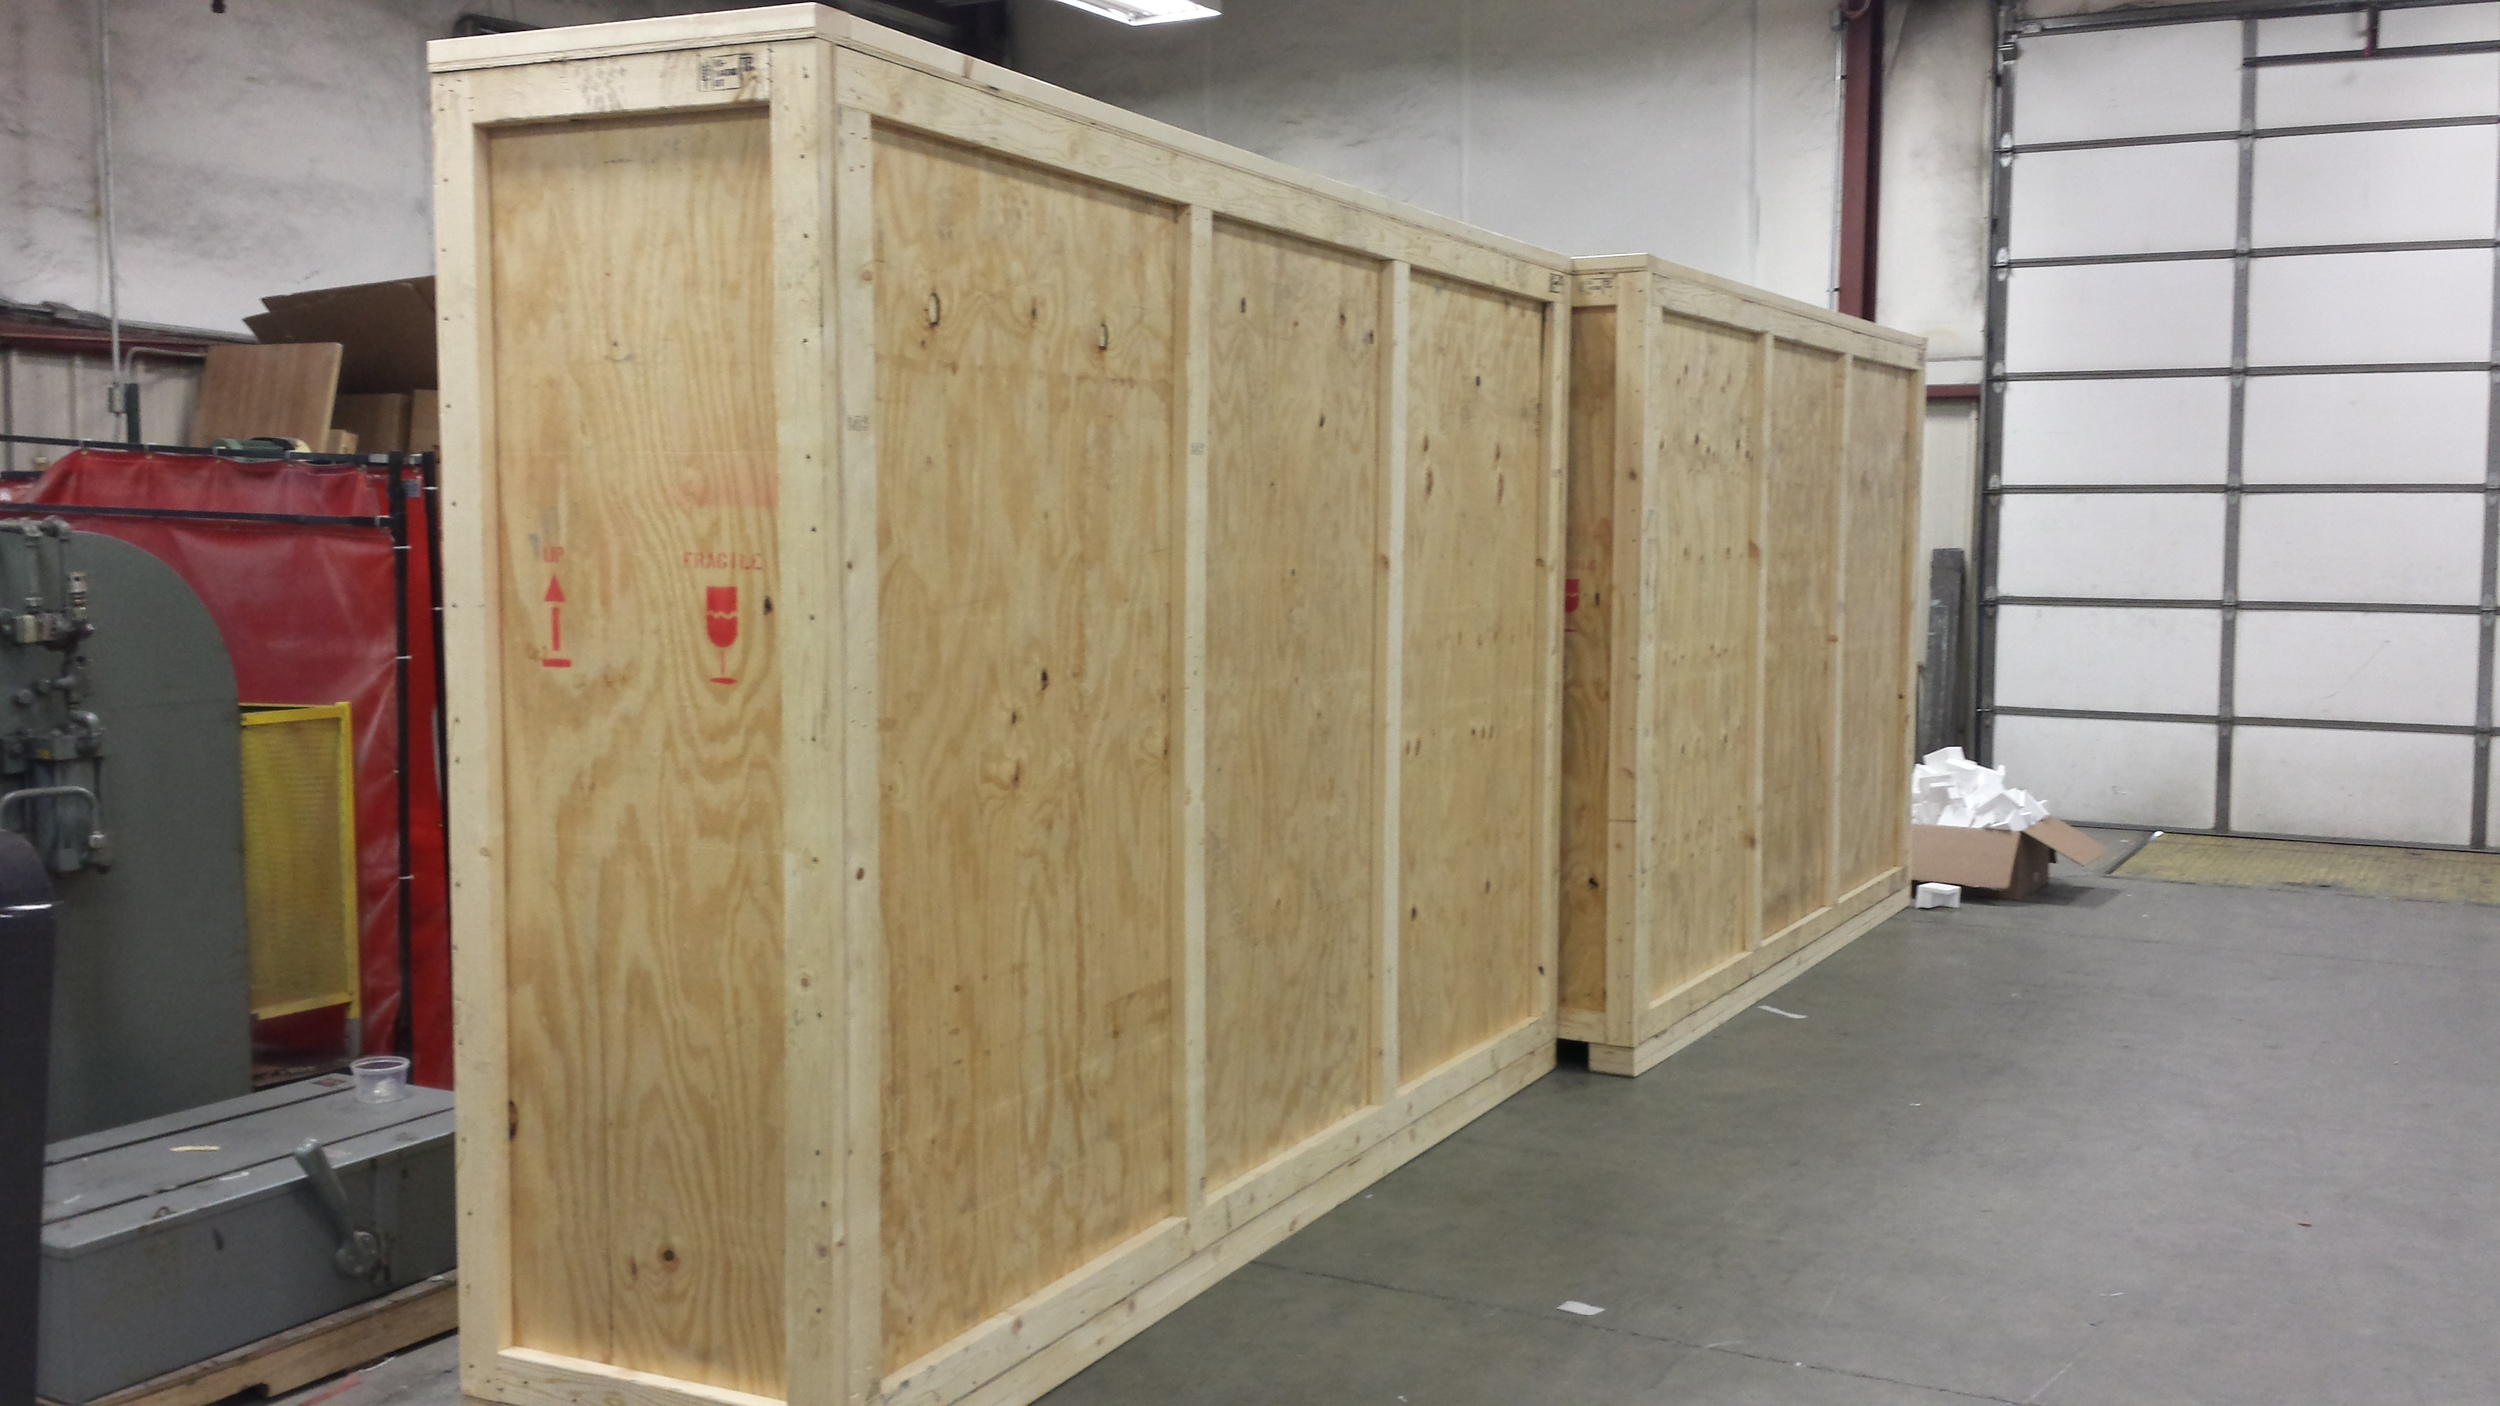 Electrical-control-panels-custom-international-shipping